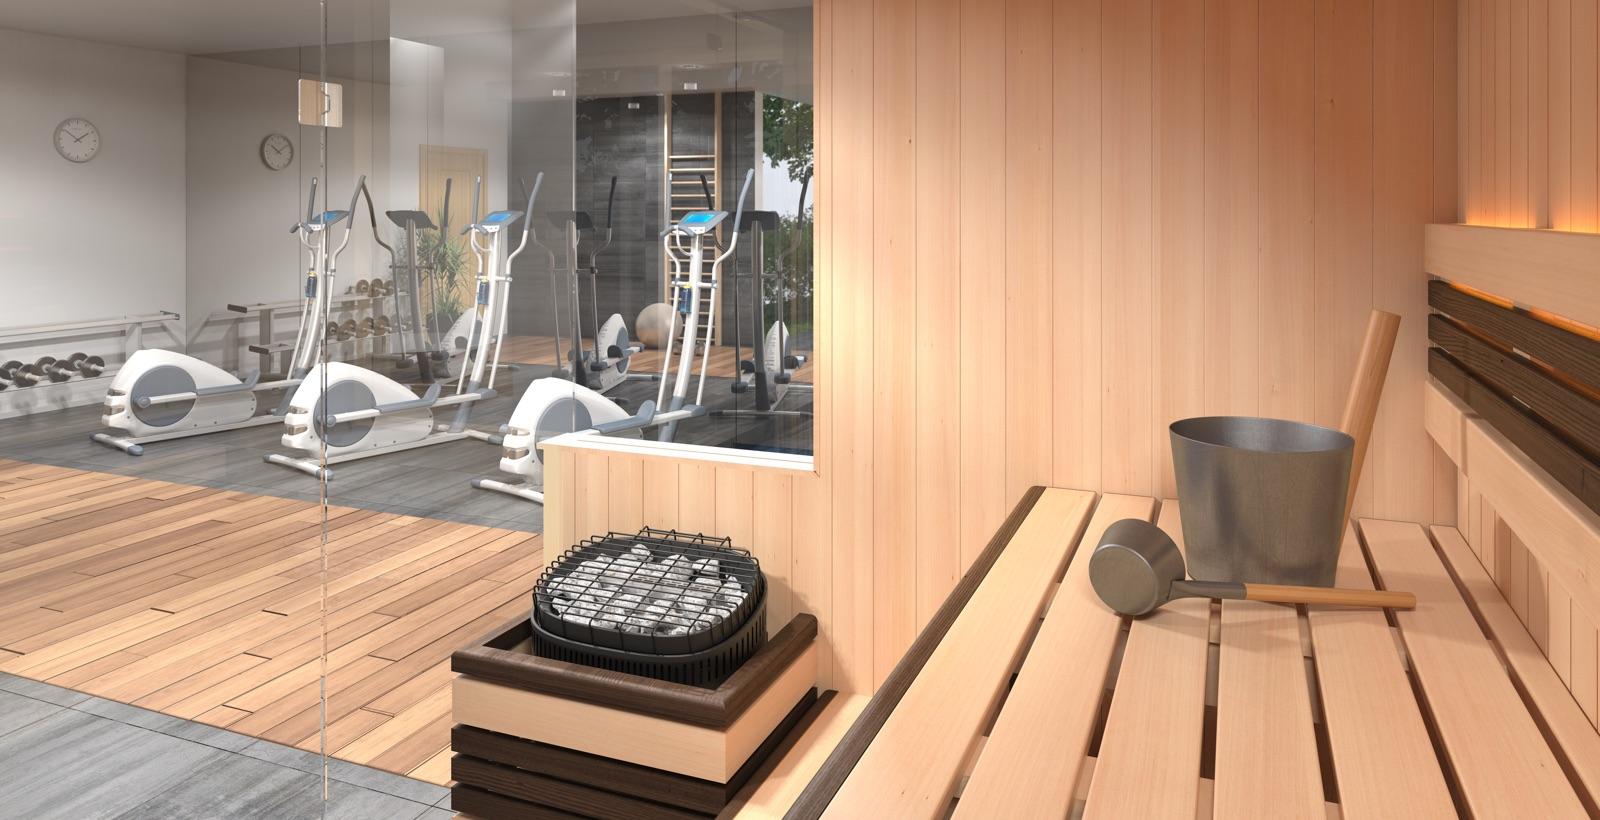 Traditional Finnish Indoor Sauna